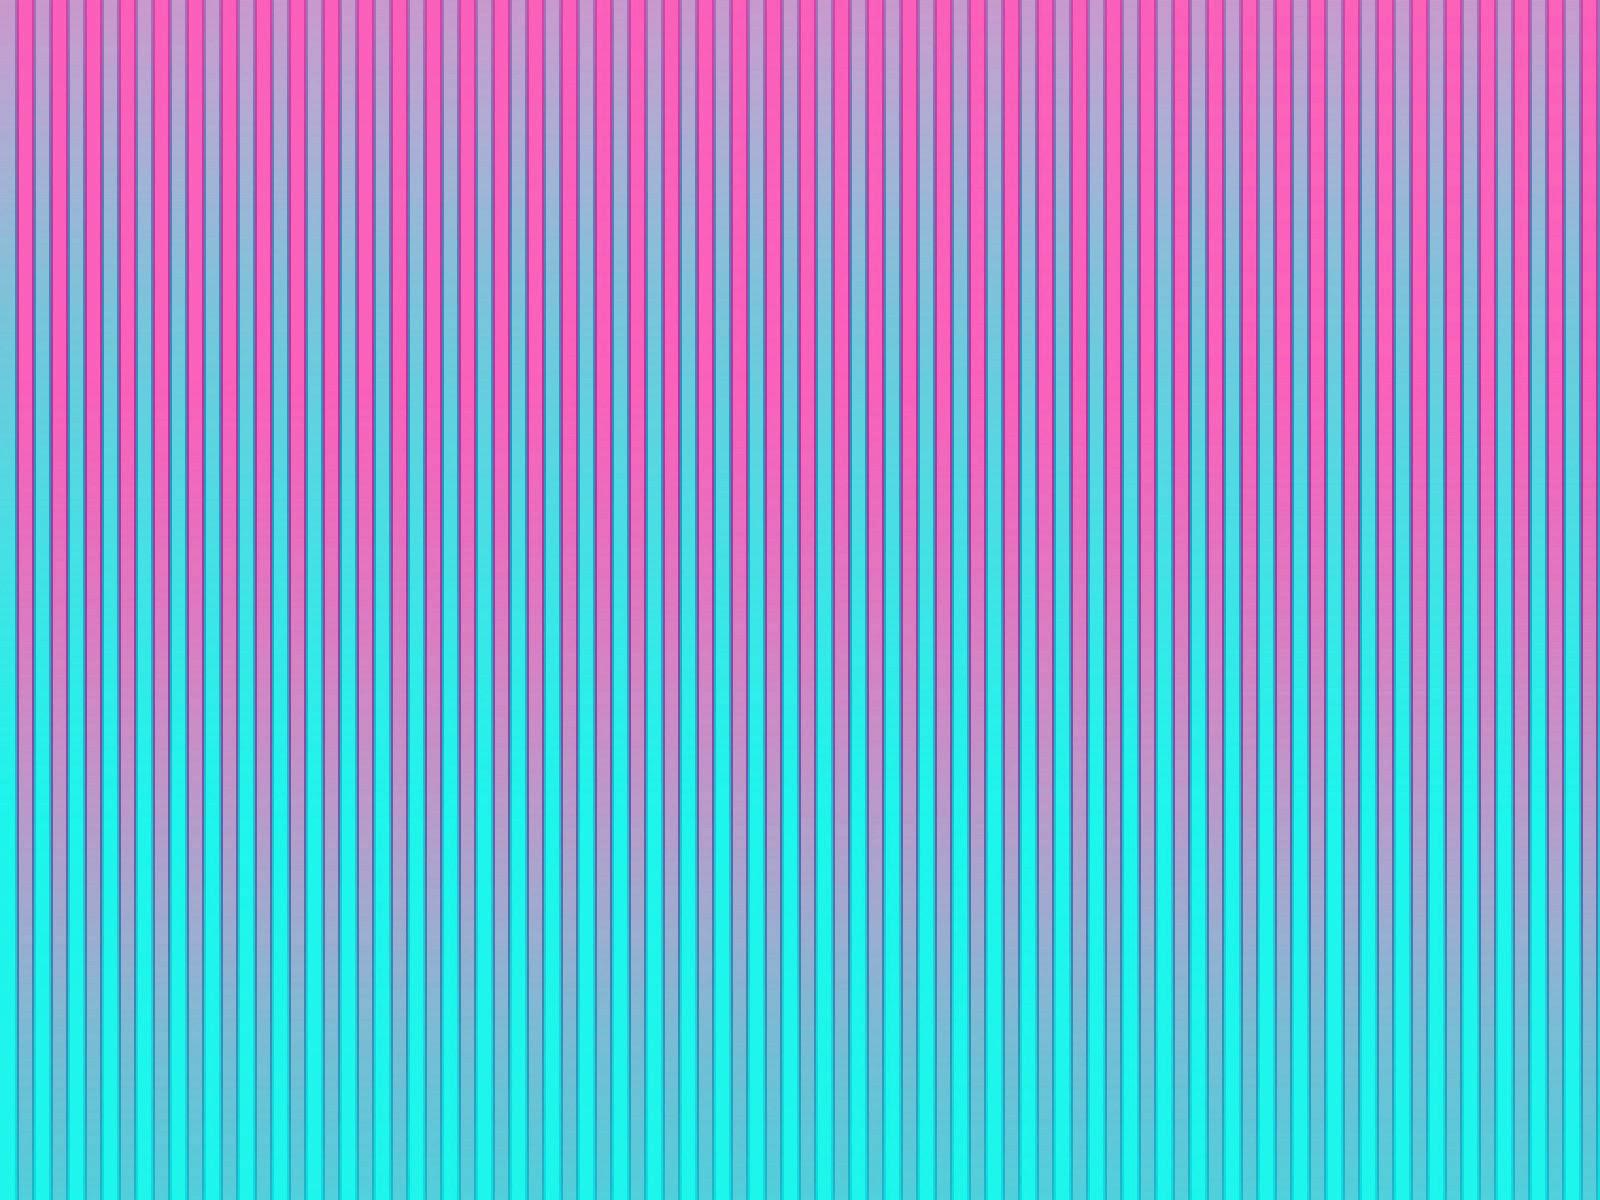 sh yn design stripe pattern wallpaper turquoise pink. Black Bedroom Furniture Sets. Home Design Ideas